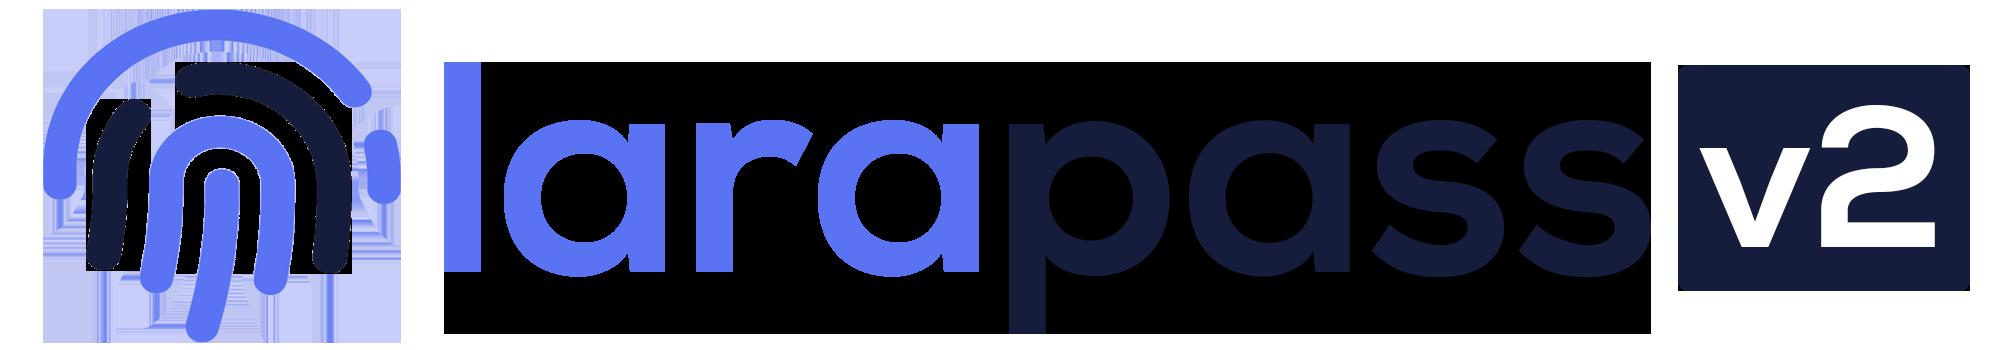 LaraPass-v2-Logo